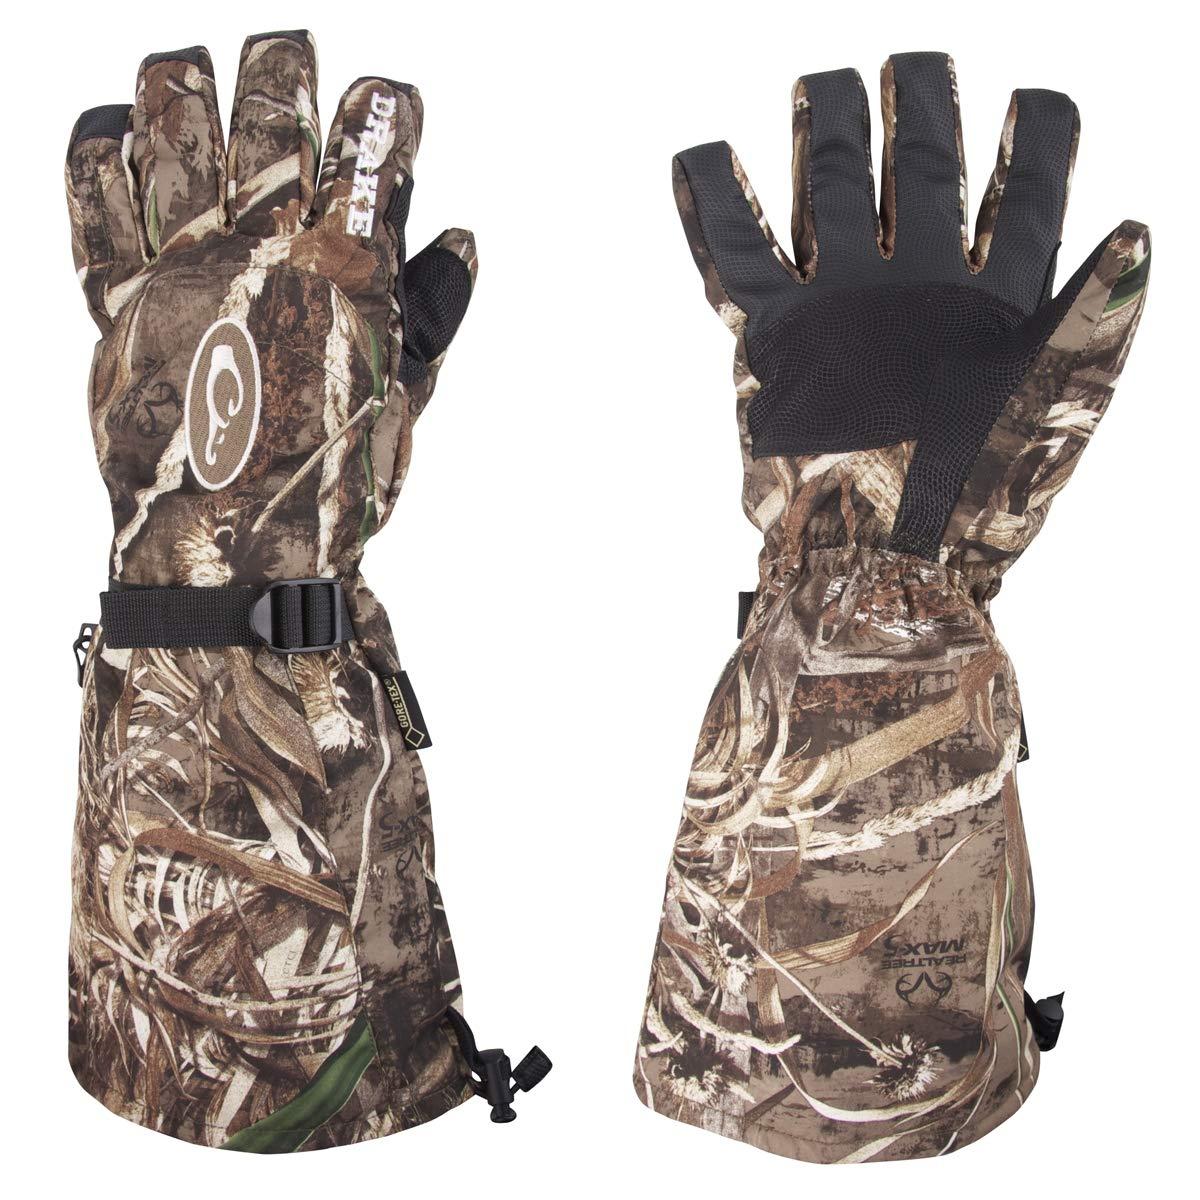 Drake Waterfowl Double Duty Decoy Gloves Gore-Tex XL